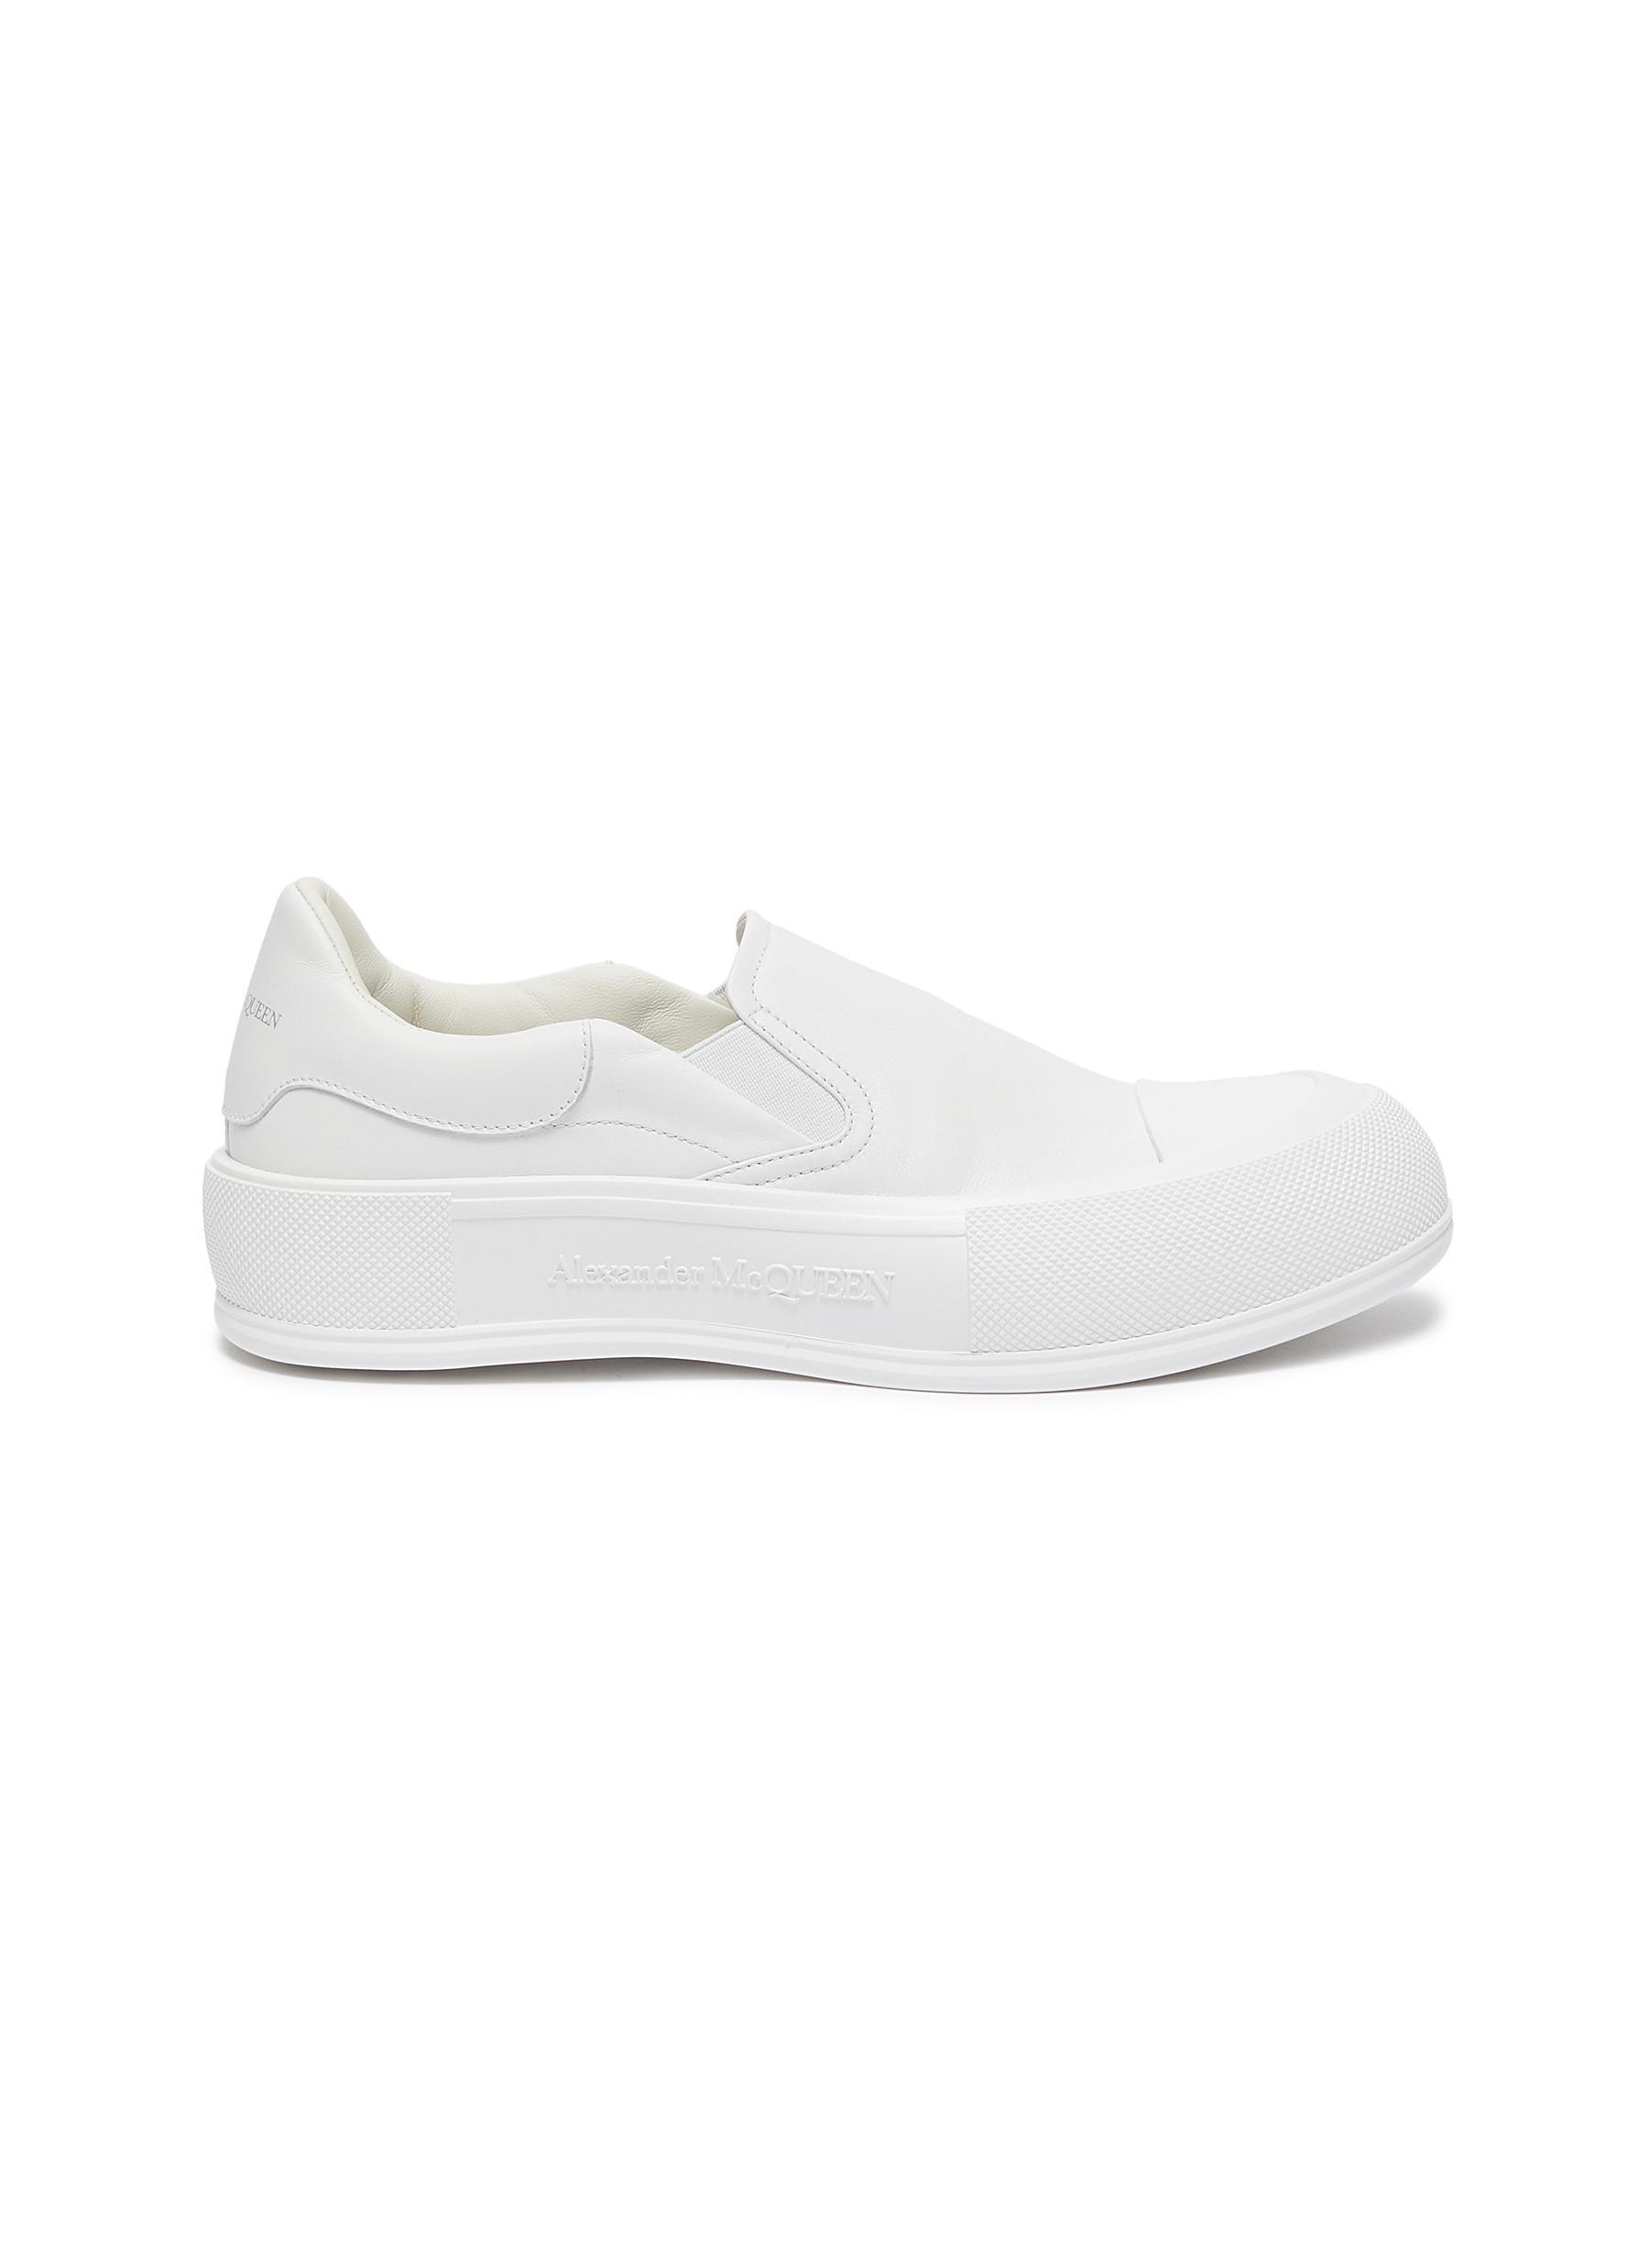 Deck Plimsoll' Slip-on Leather Sneakers